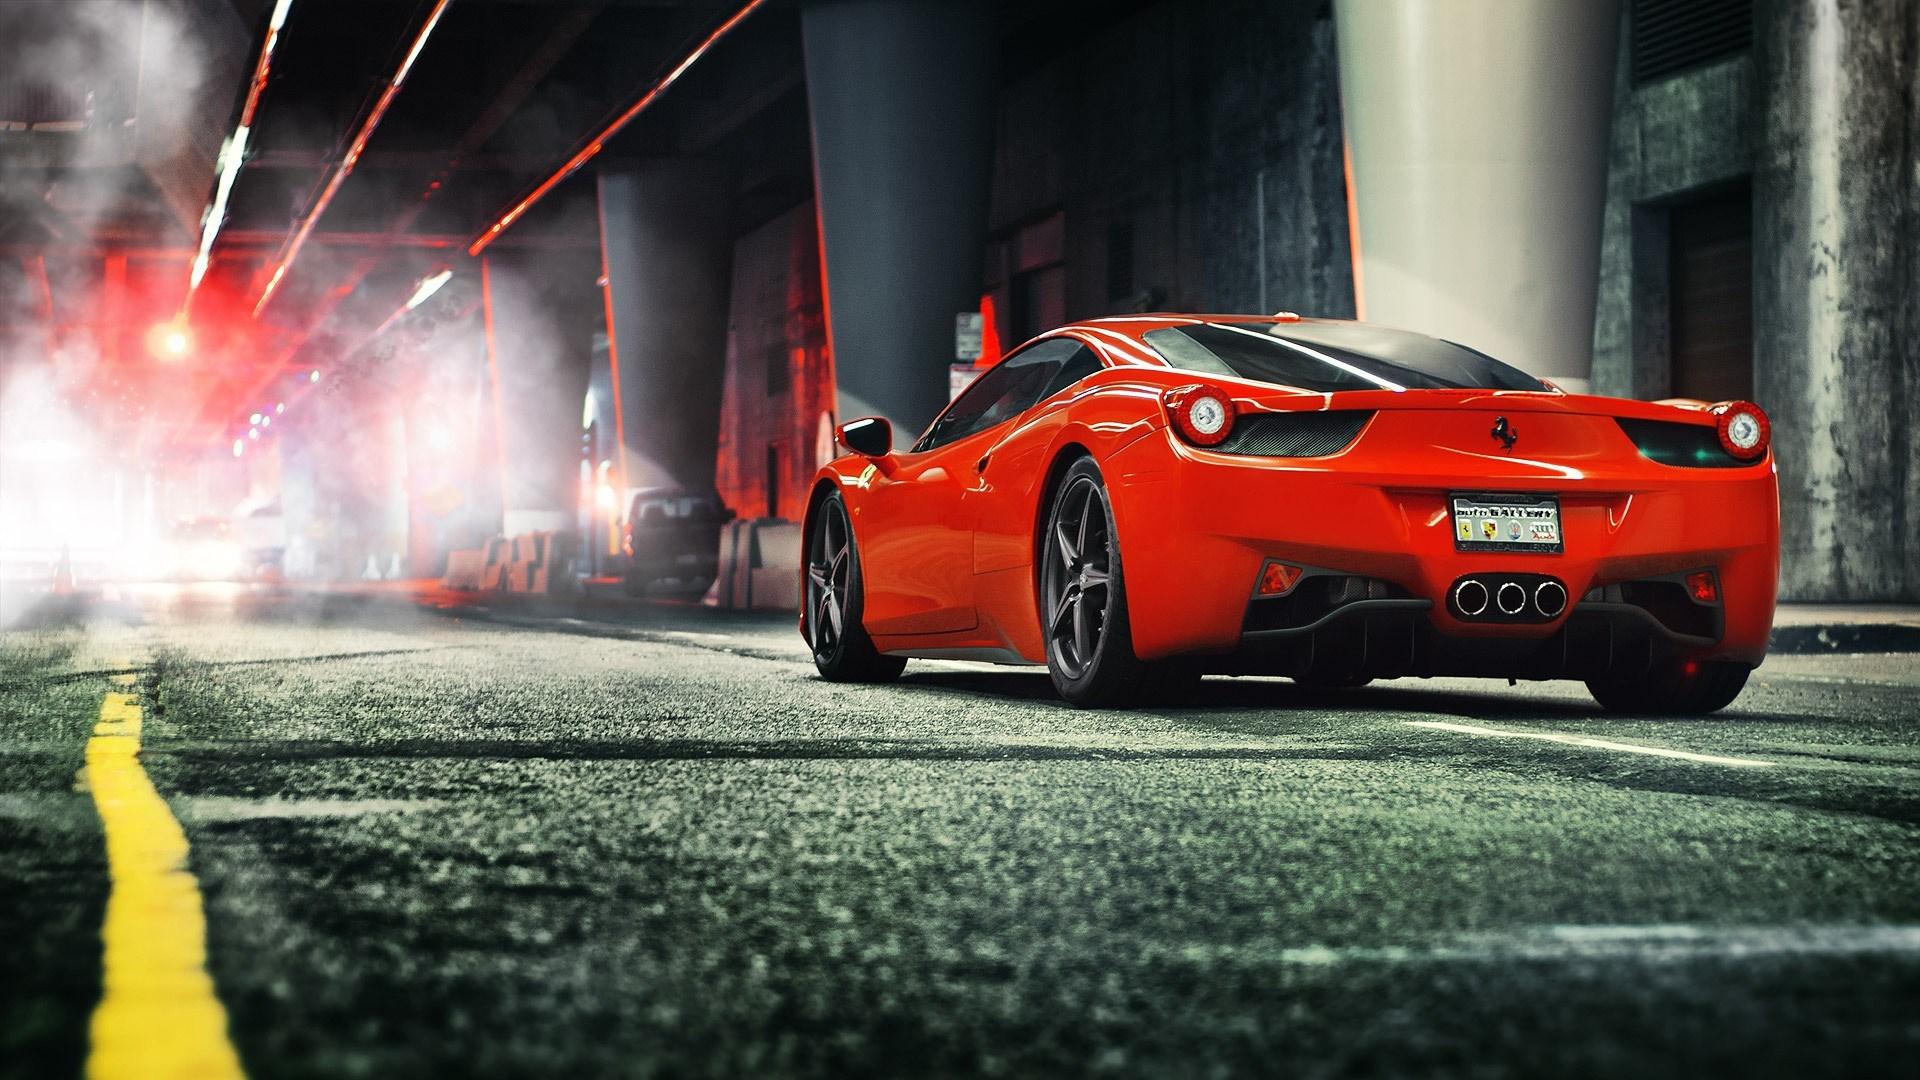 Hd Ferrari Wallpapers For Free Download